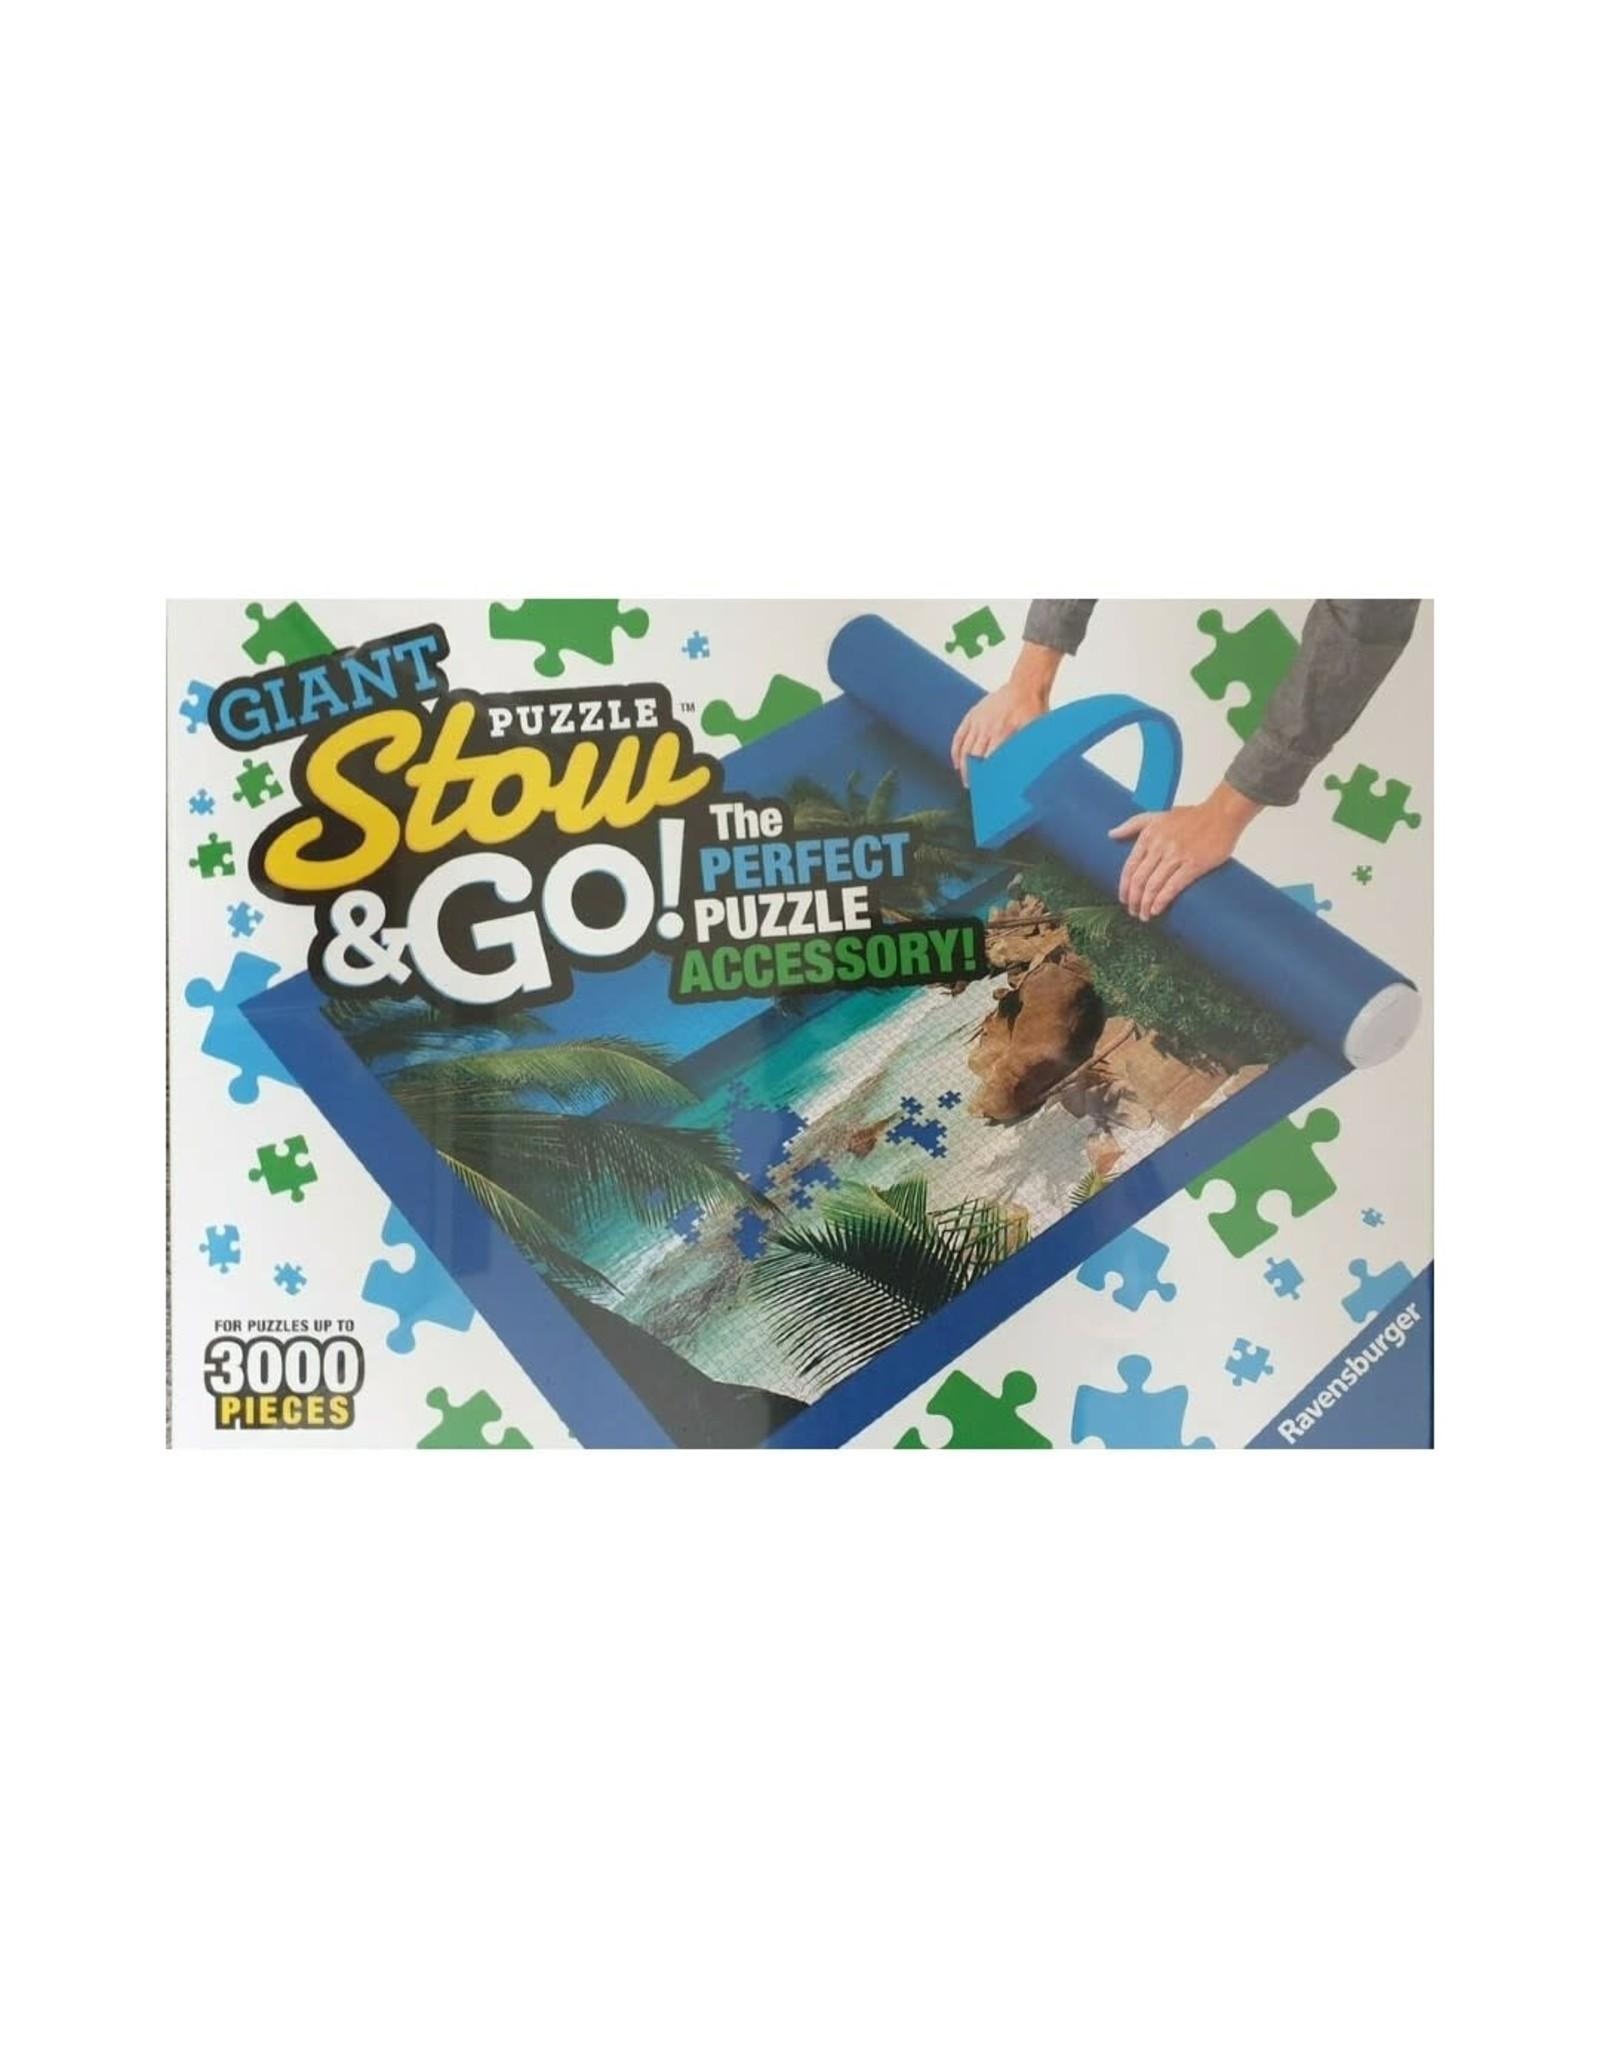 Ravensburger Giant Puzzle Stow & Go!